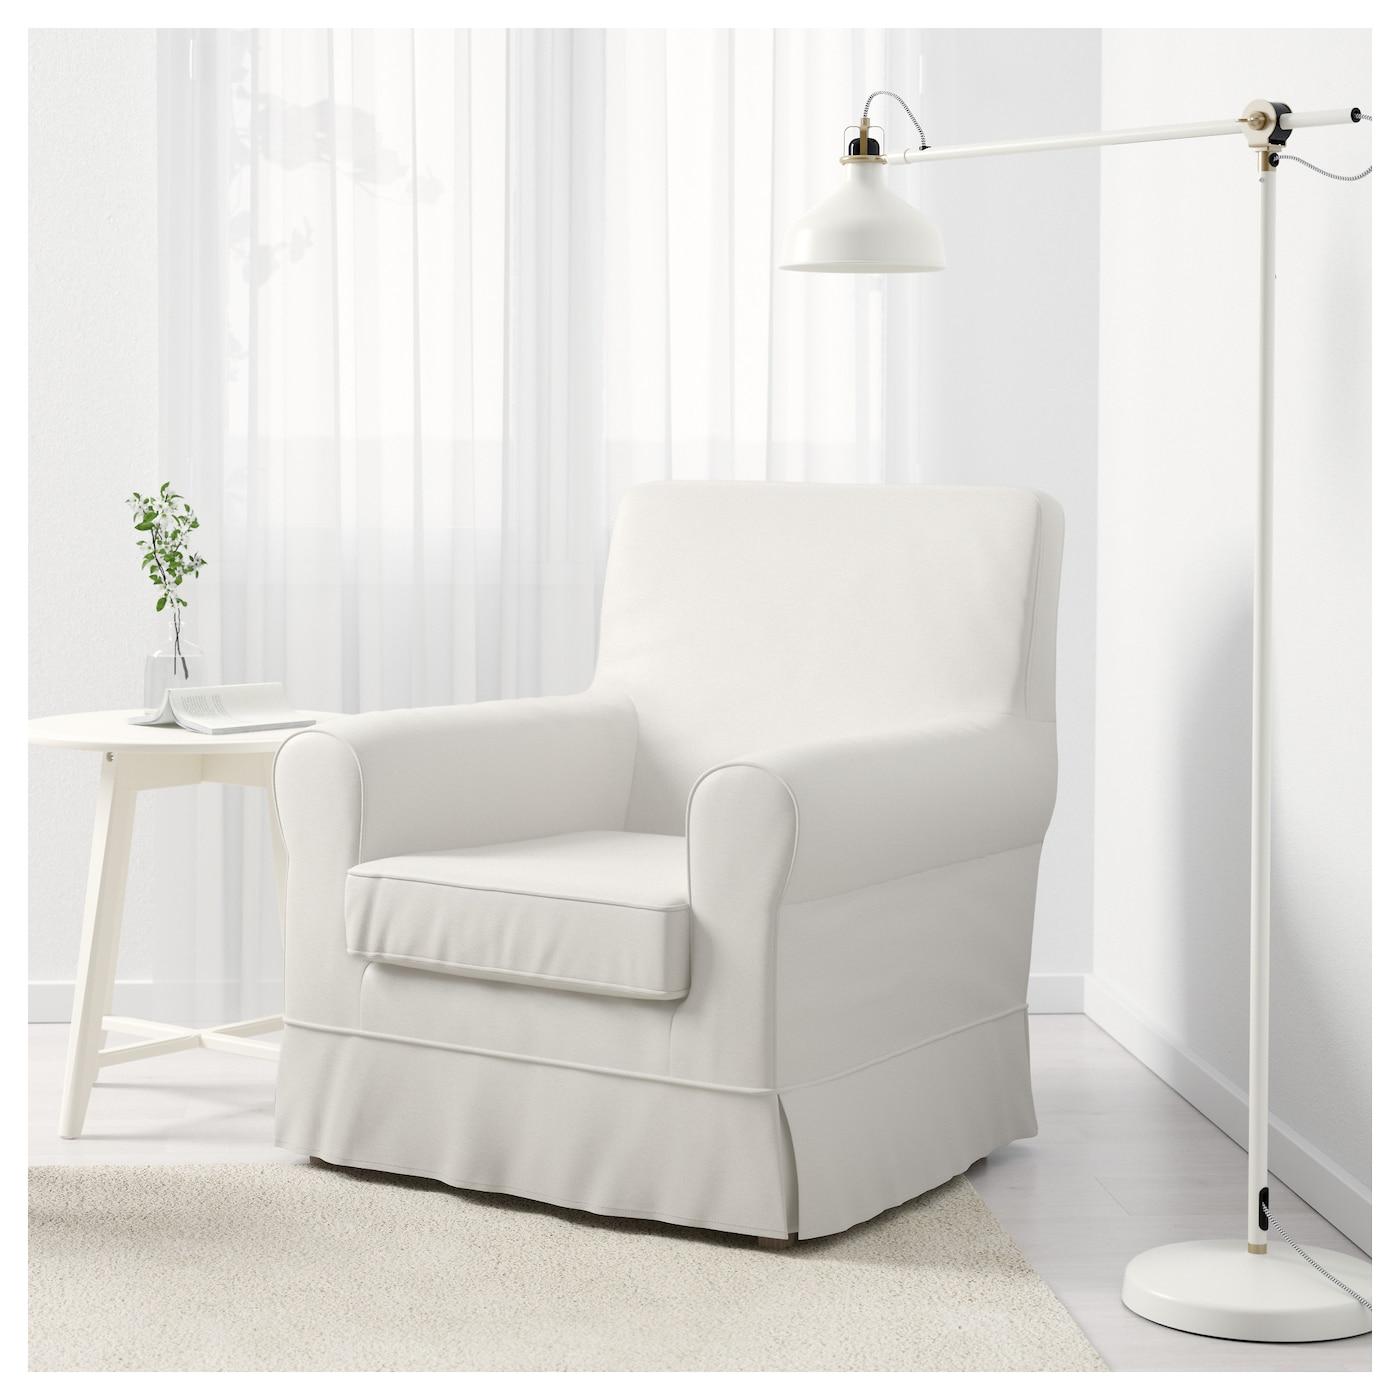 Jennylund armchair sten sa white ikea for Small white armchair